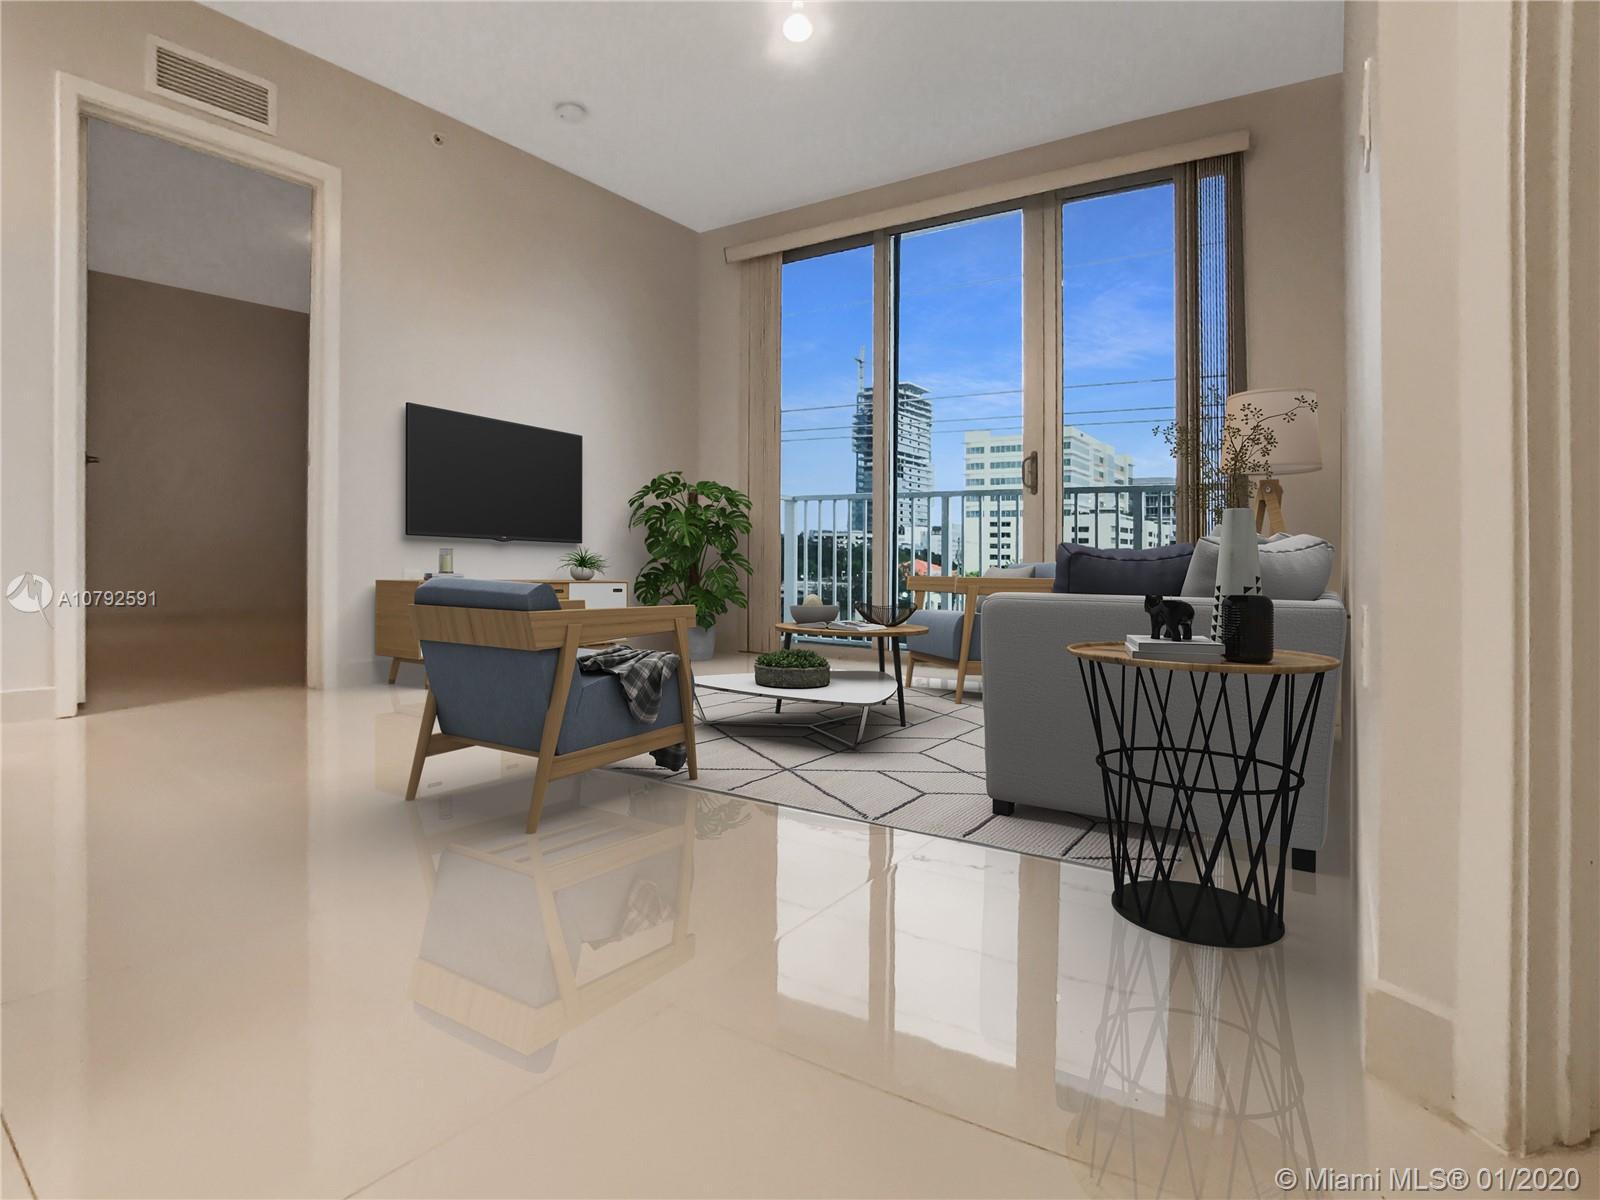 2651 NE 212th Ter #401, Aventura, FL 33180 - Aventura, FL real estate listing